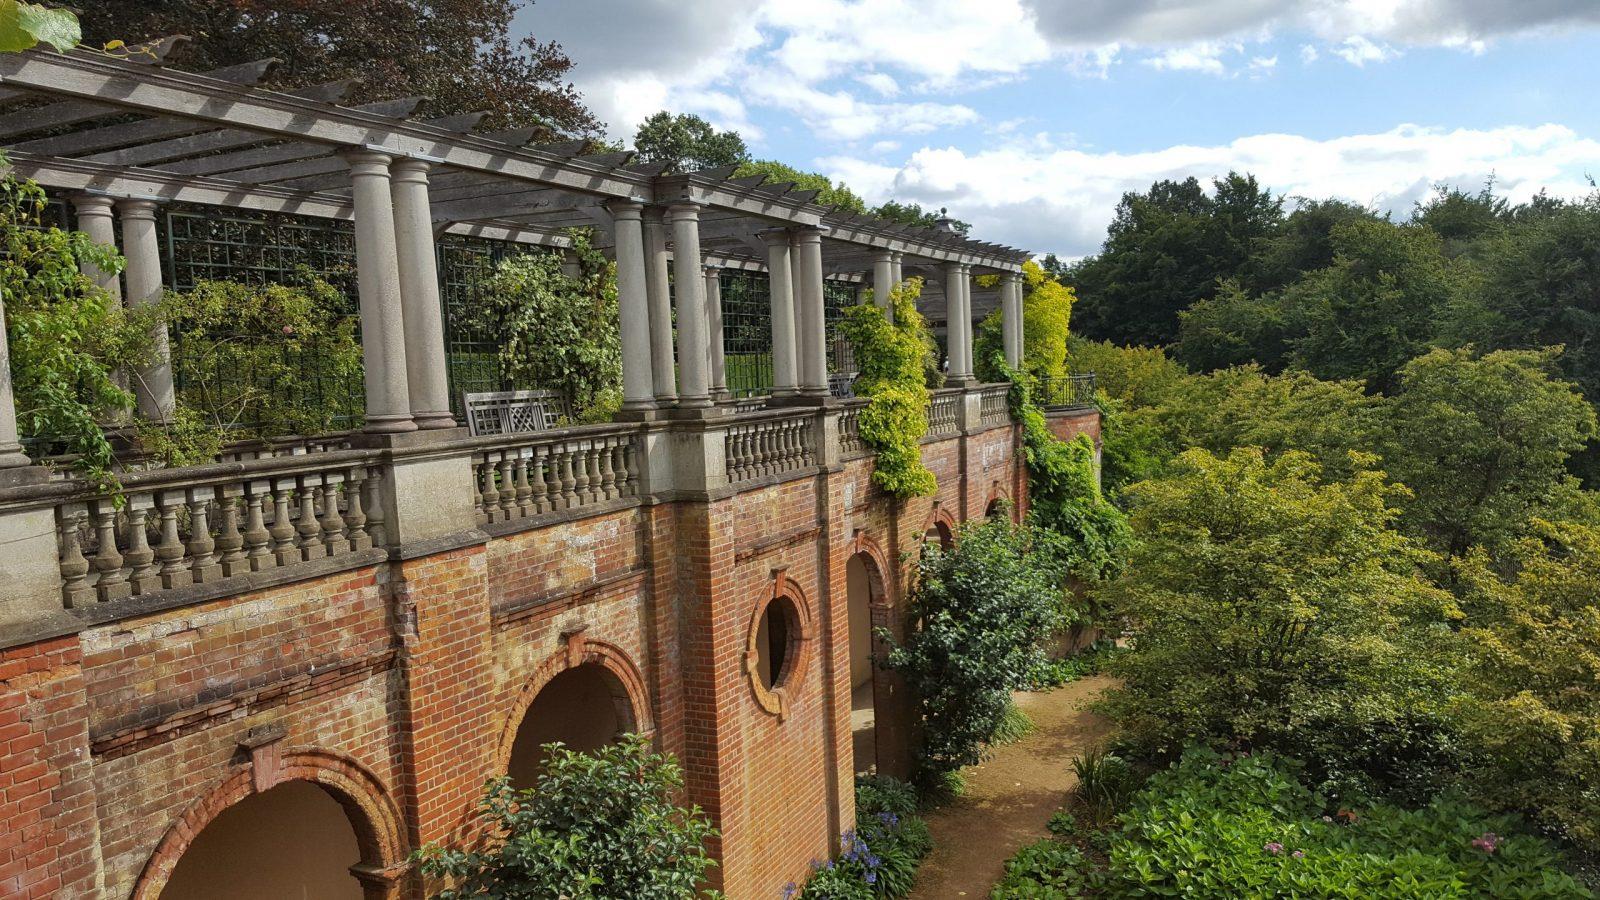 Visiting Hill Garden & Pergola, Hampstead Heath: Photo Gallery 14